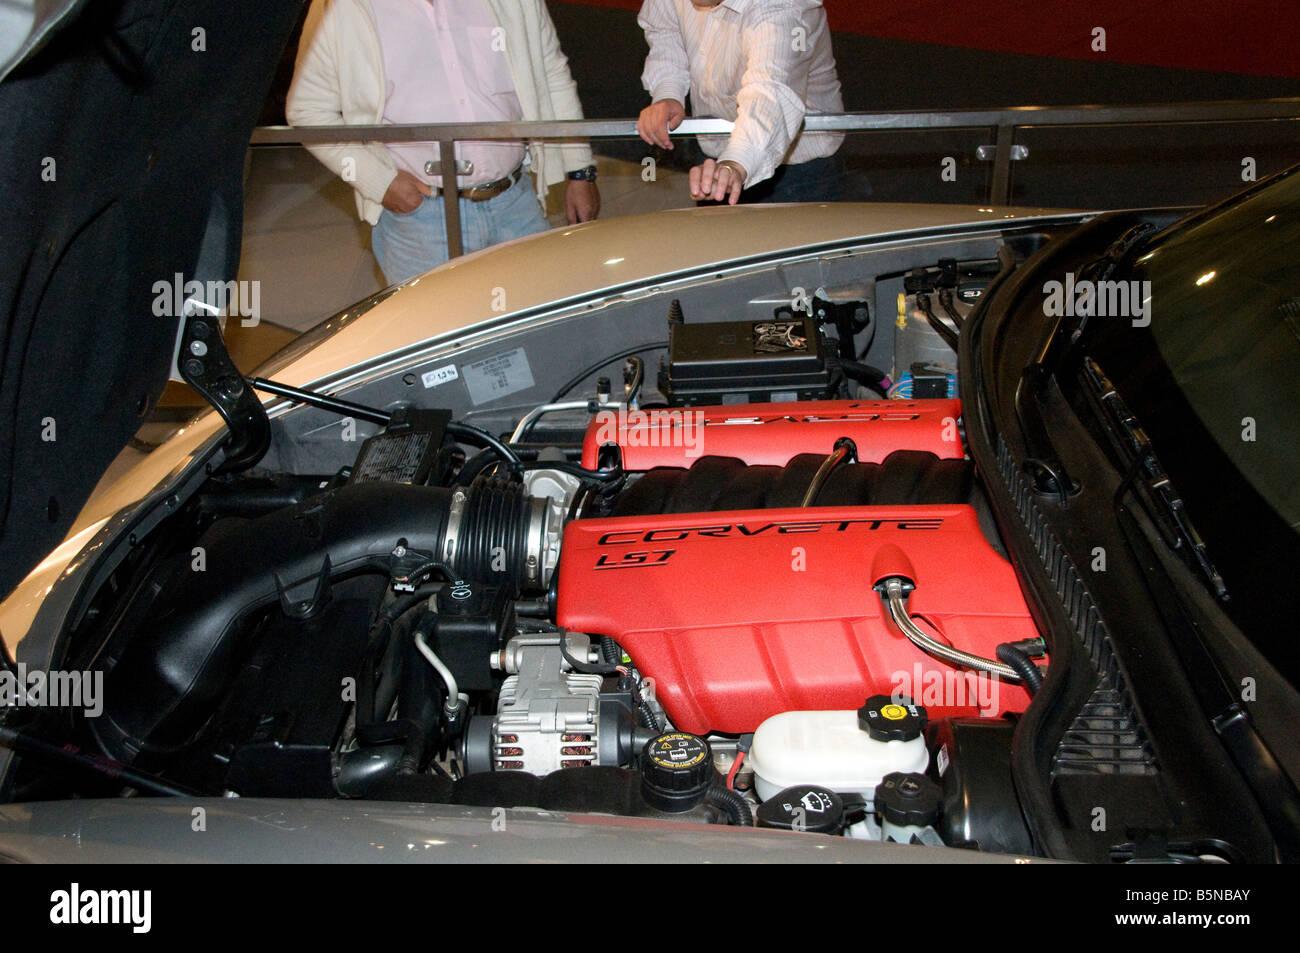 corvette engine stock photos corvette engine stock images alamy. Black Bedroom Furniture Sets. Home Design Ideas